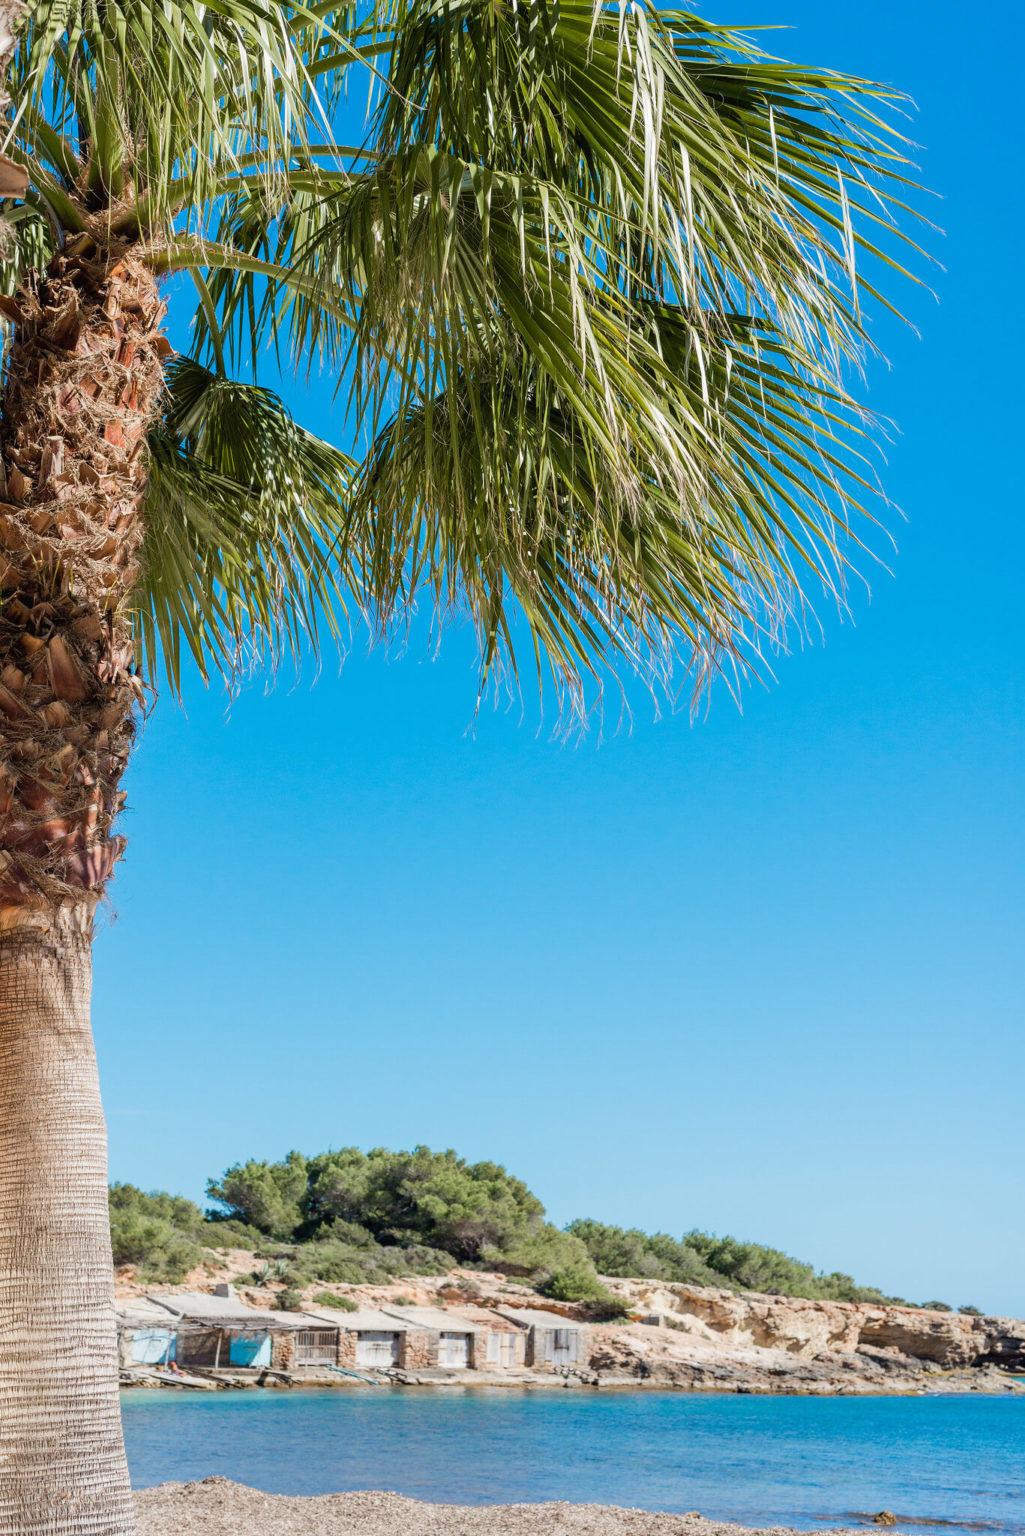 https://www.white-ibiza.com/wp-content/uploads/2020/03/ibiza-beaches-sestanyol-06-1025x1536.jpg